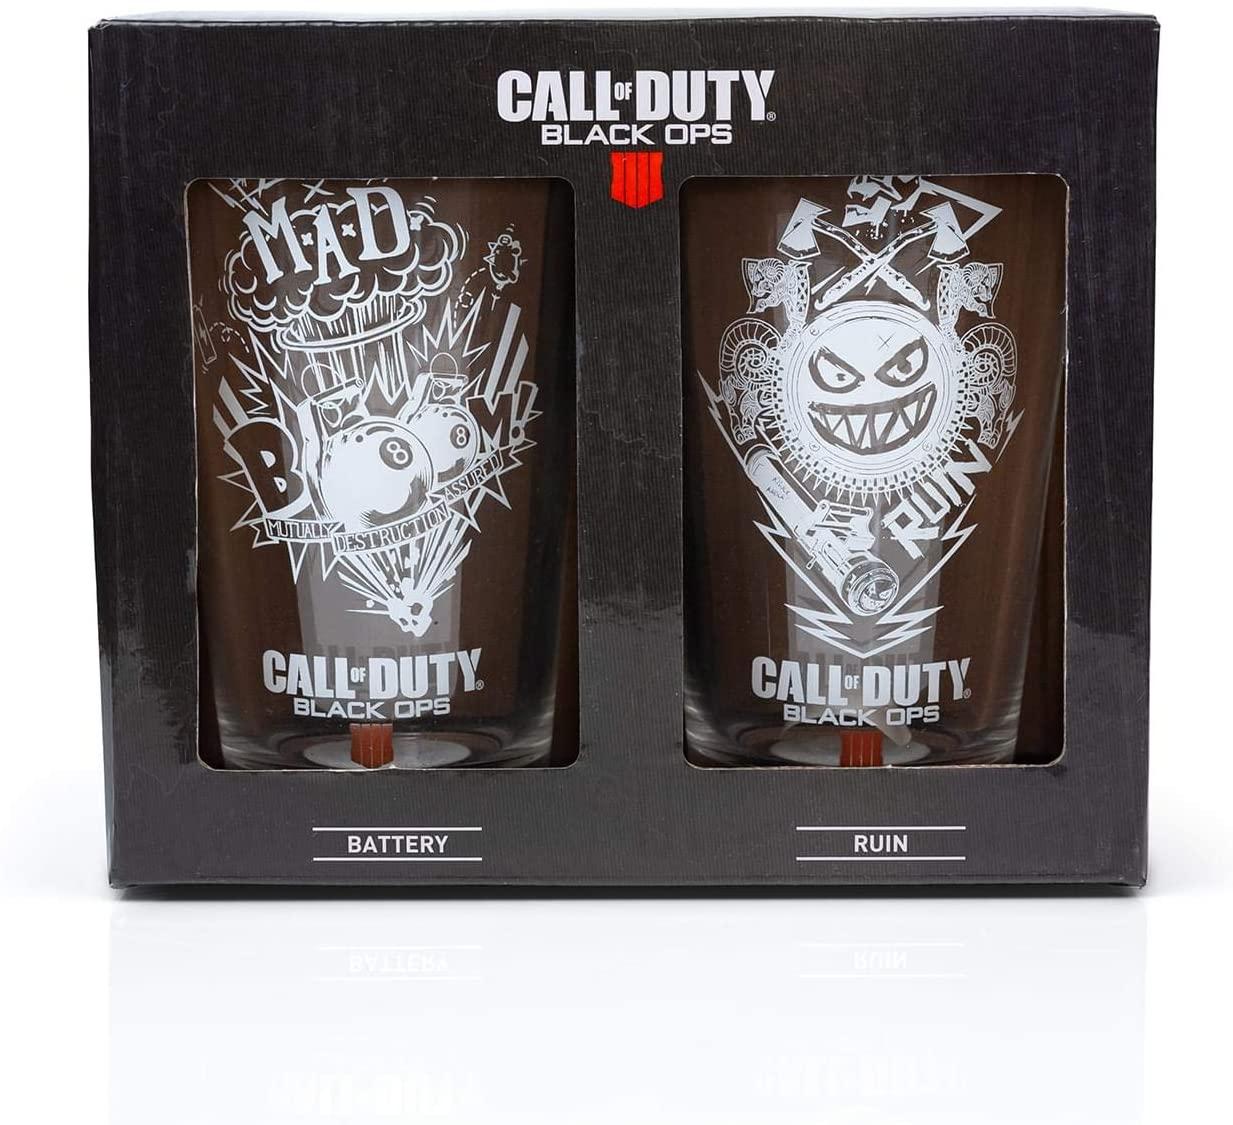 Vasos transparentesC all of Duty Black Ops 4  de 17 oz